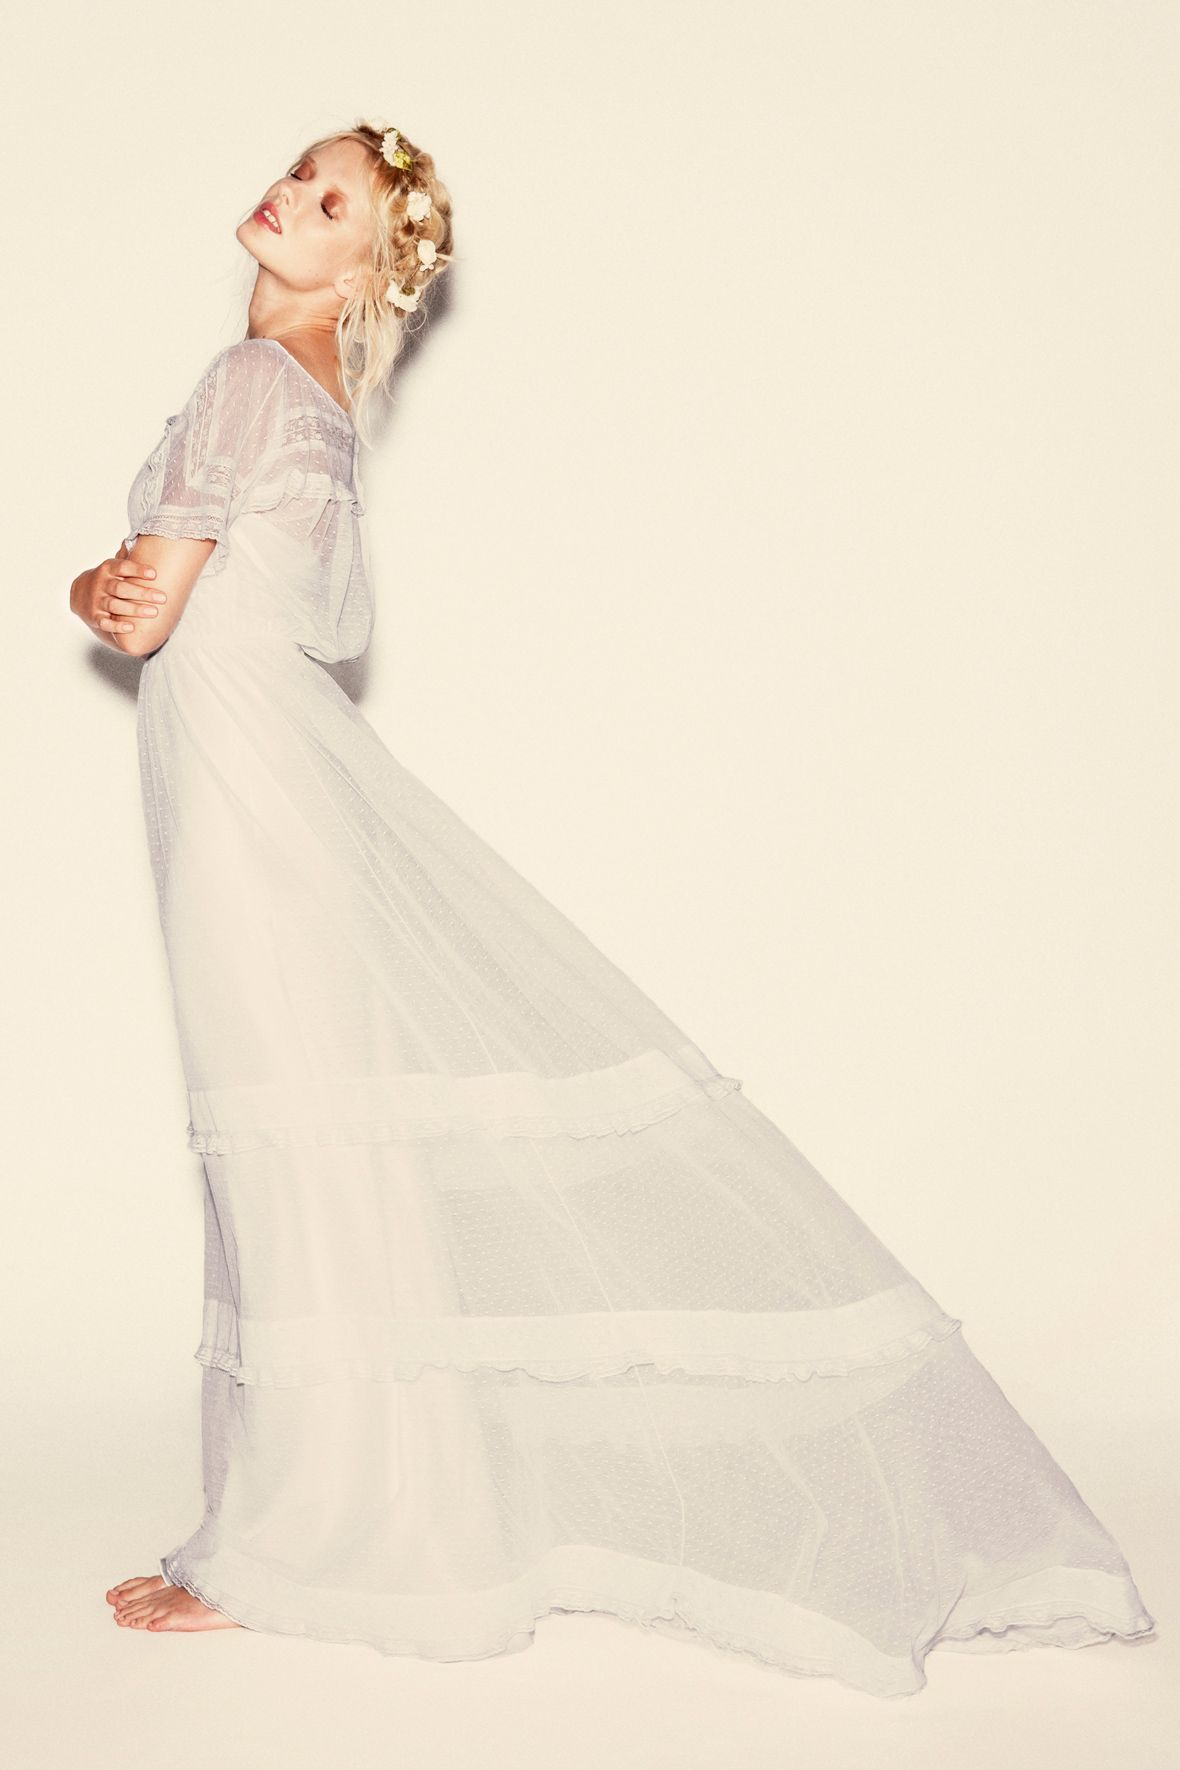 Delphine manivet designer ellie saub pinterest gowns flower